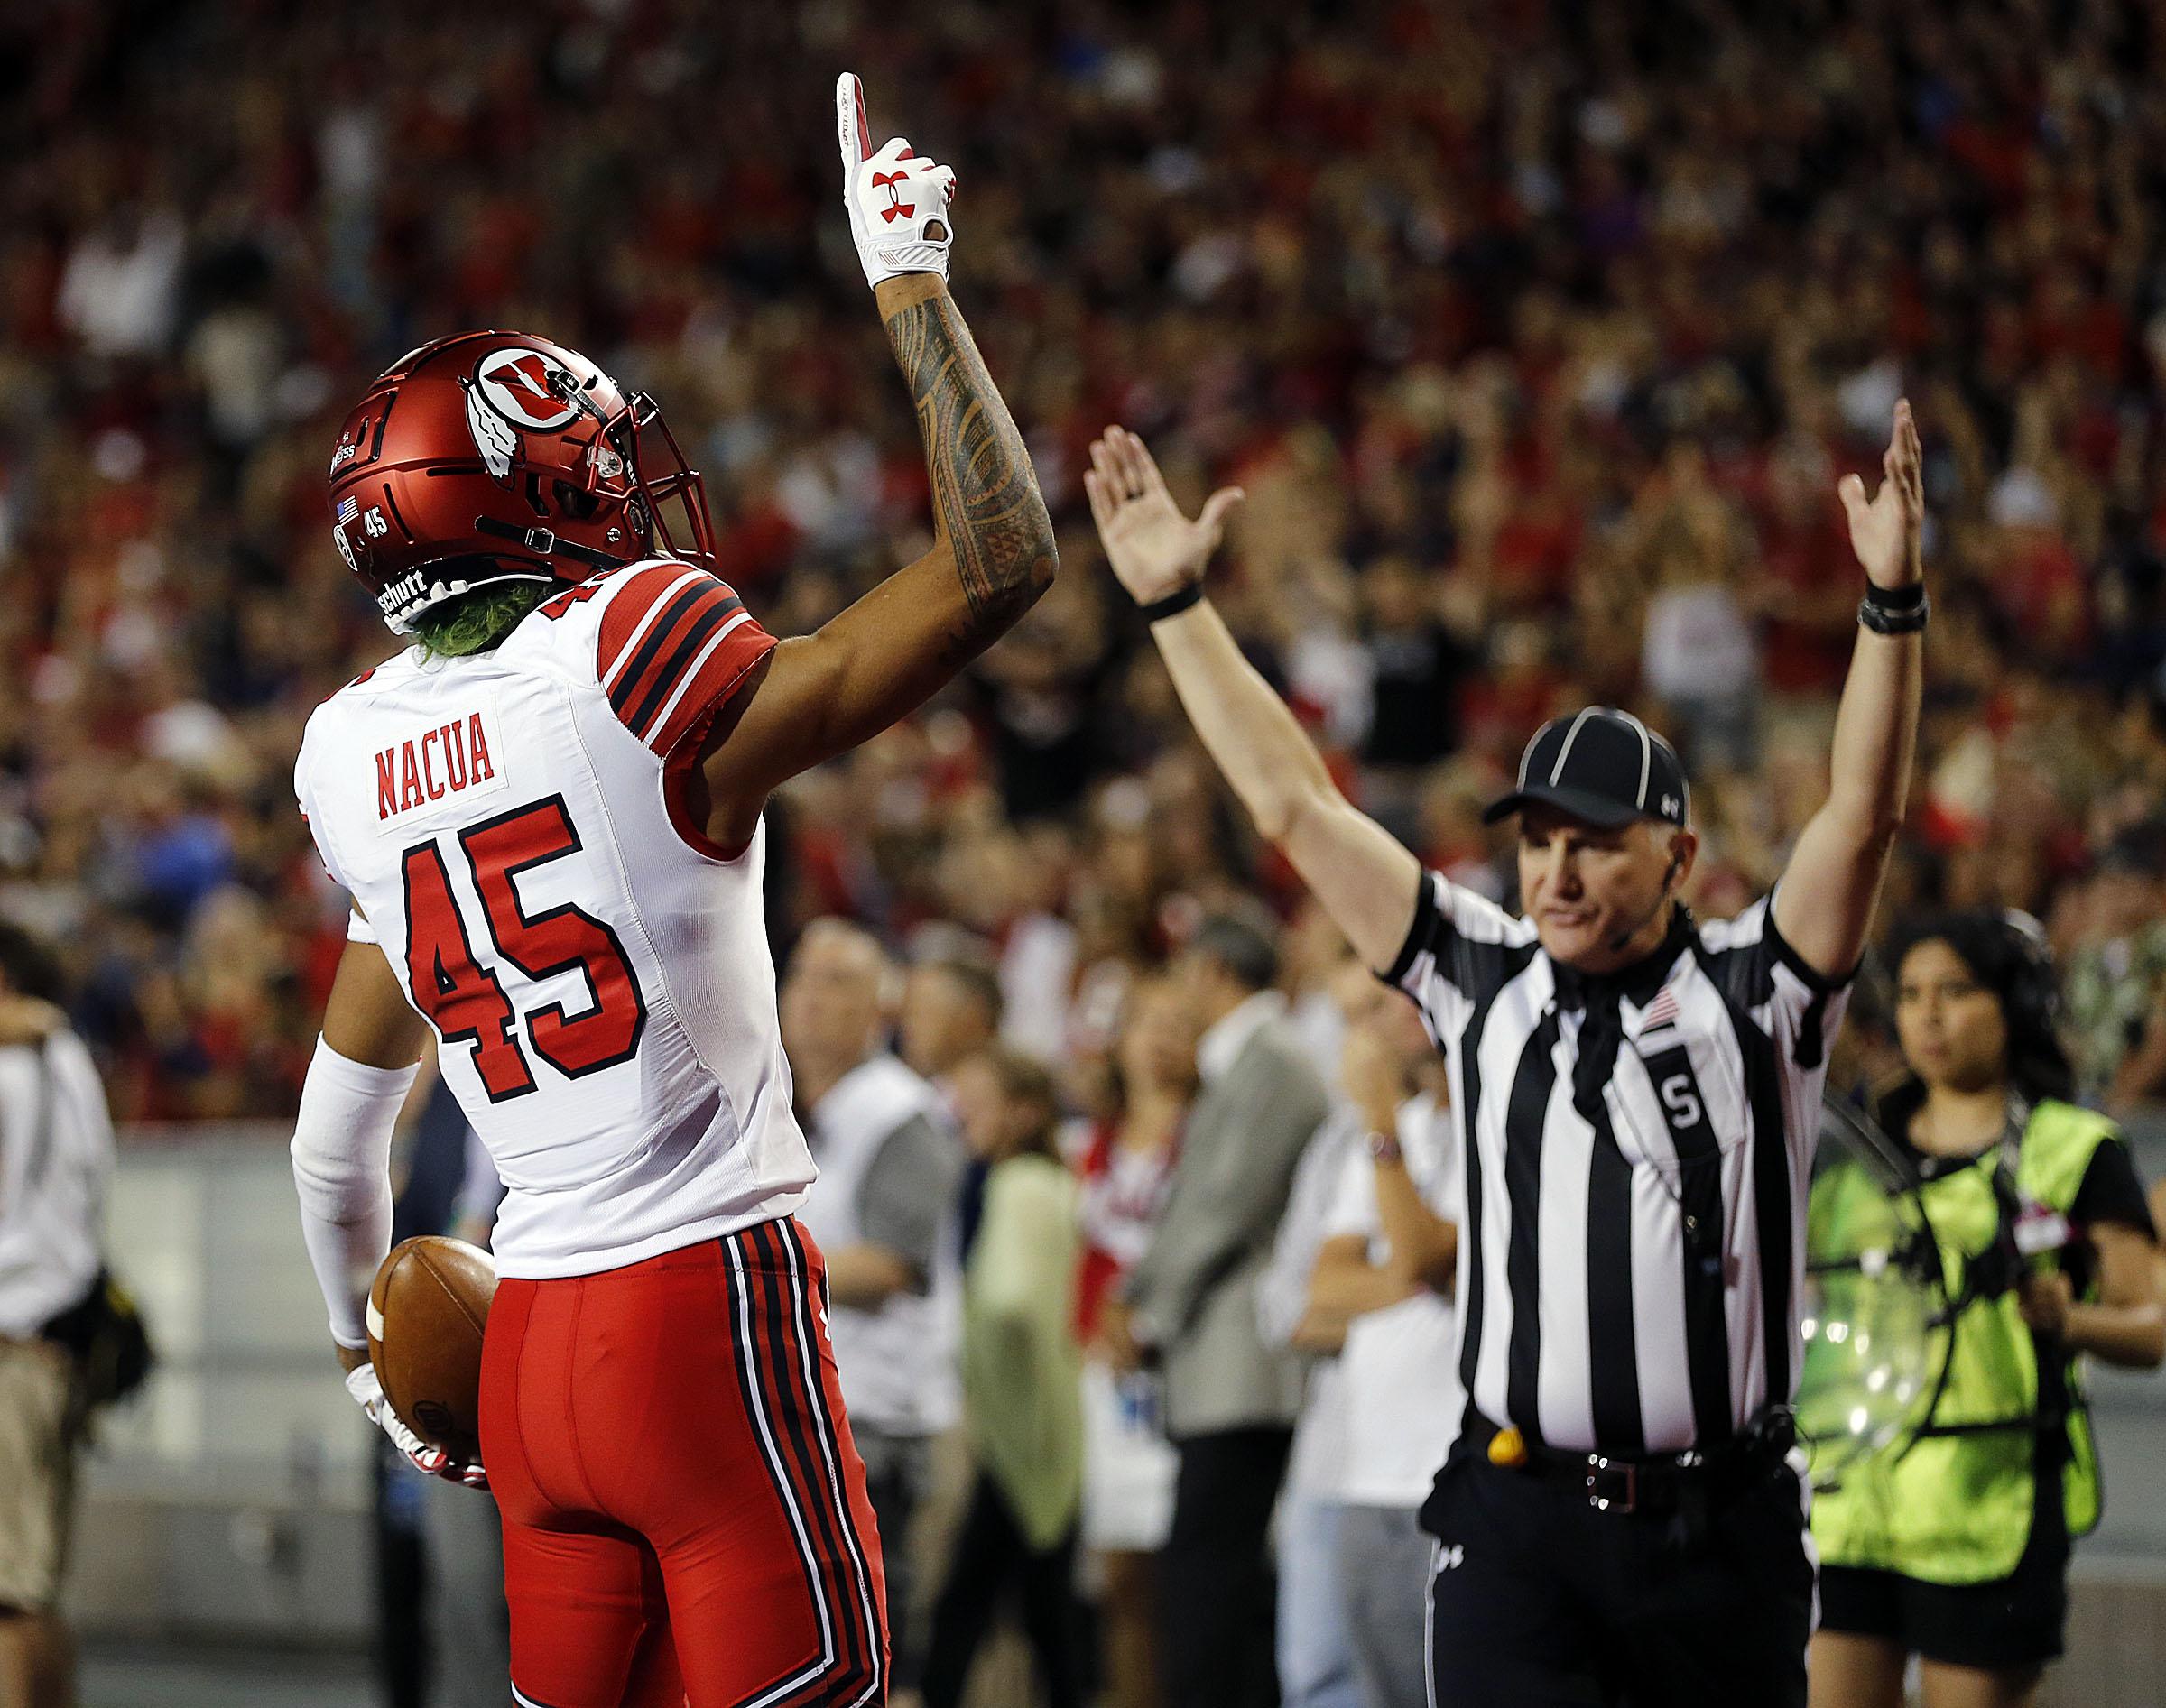 Utah wide receiver Samson Nacua celebrates a touchdown against Arizona in Tucson on Friday, Sept. 22, 2017.